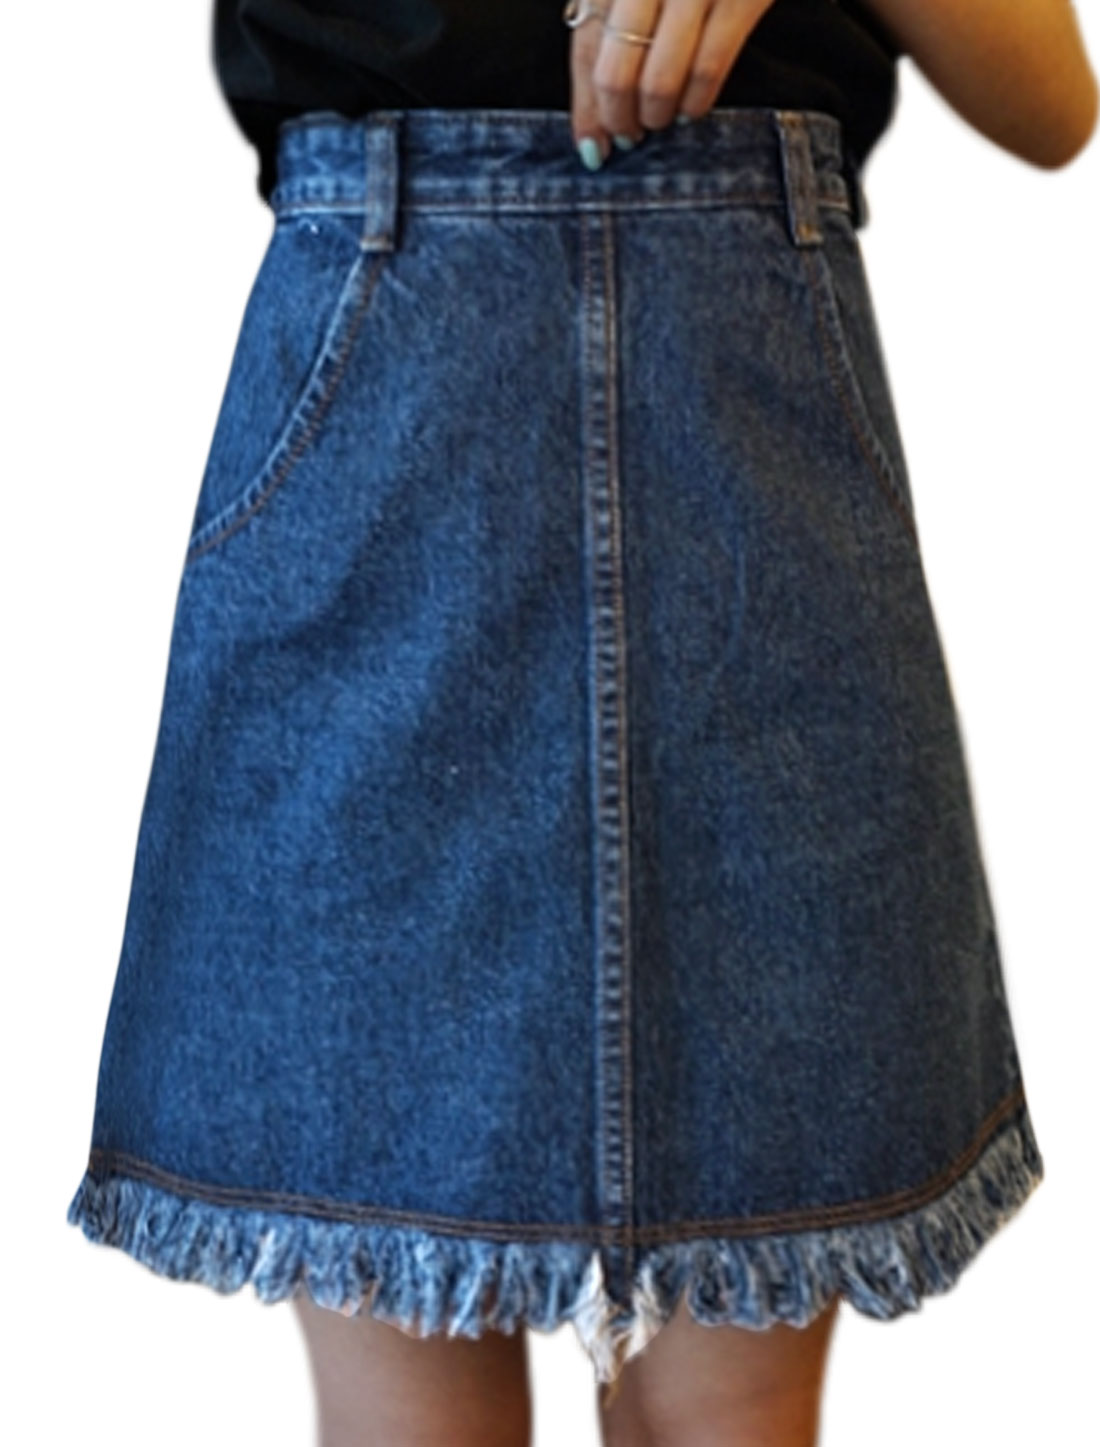 Women Pockets Front Frayed Hem Zip Up Side Denim A-Line Skirt Blue M